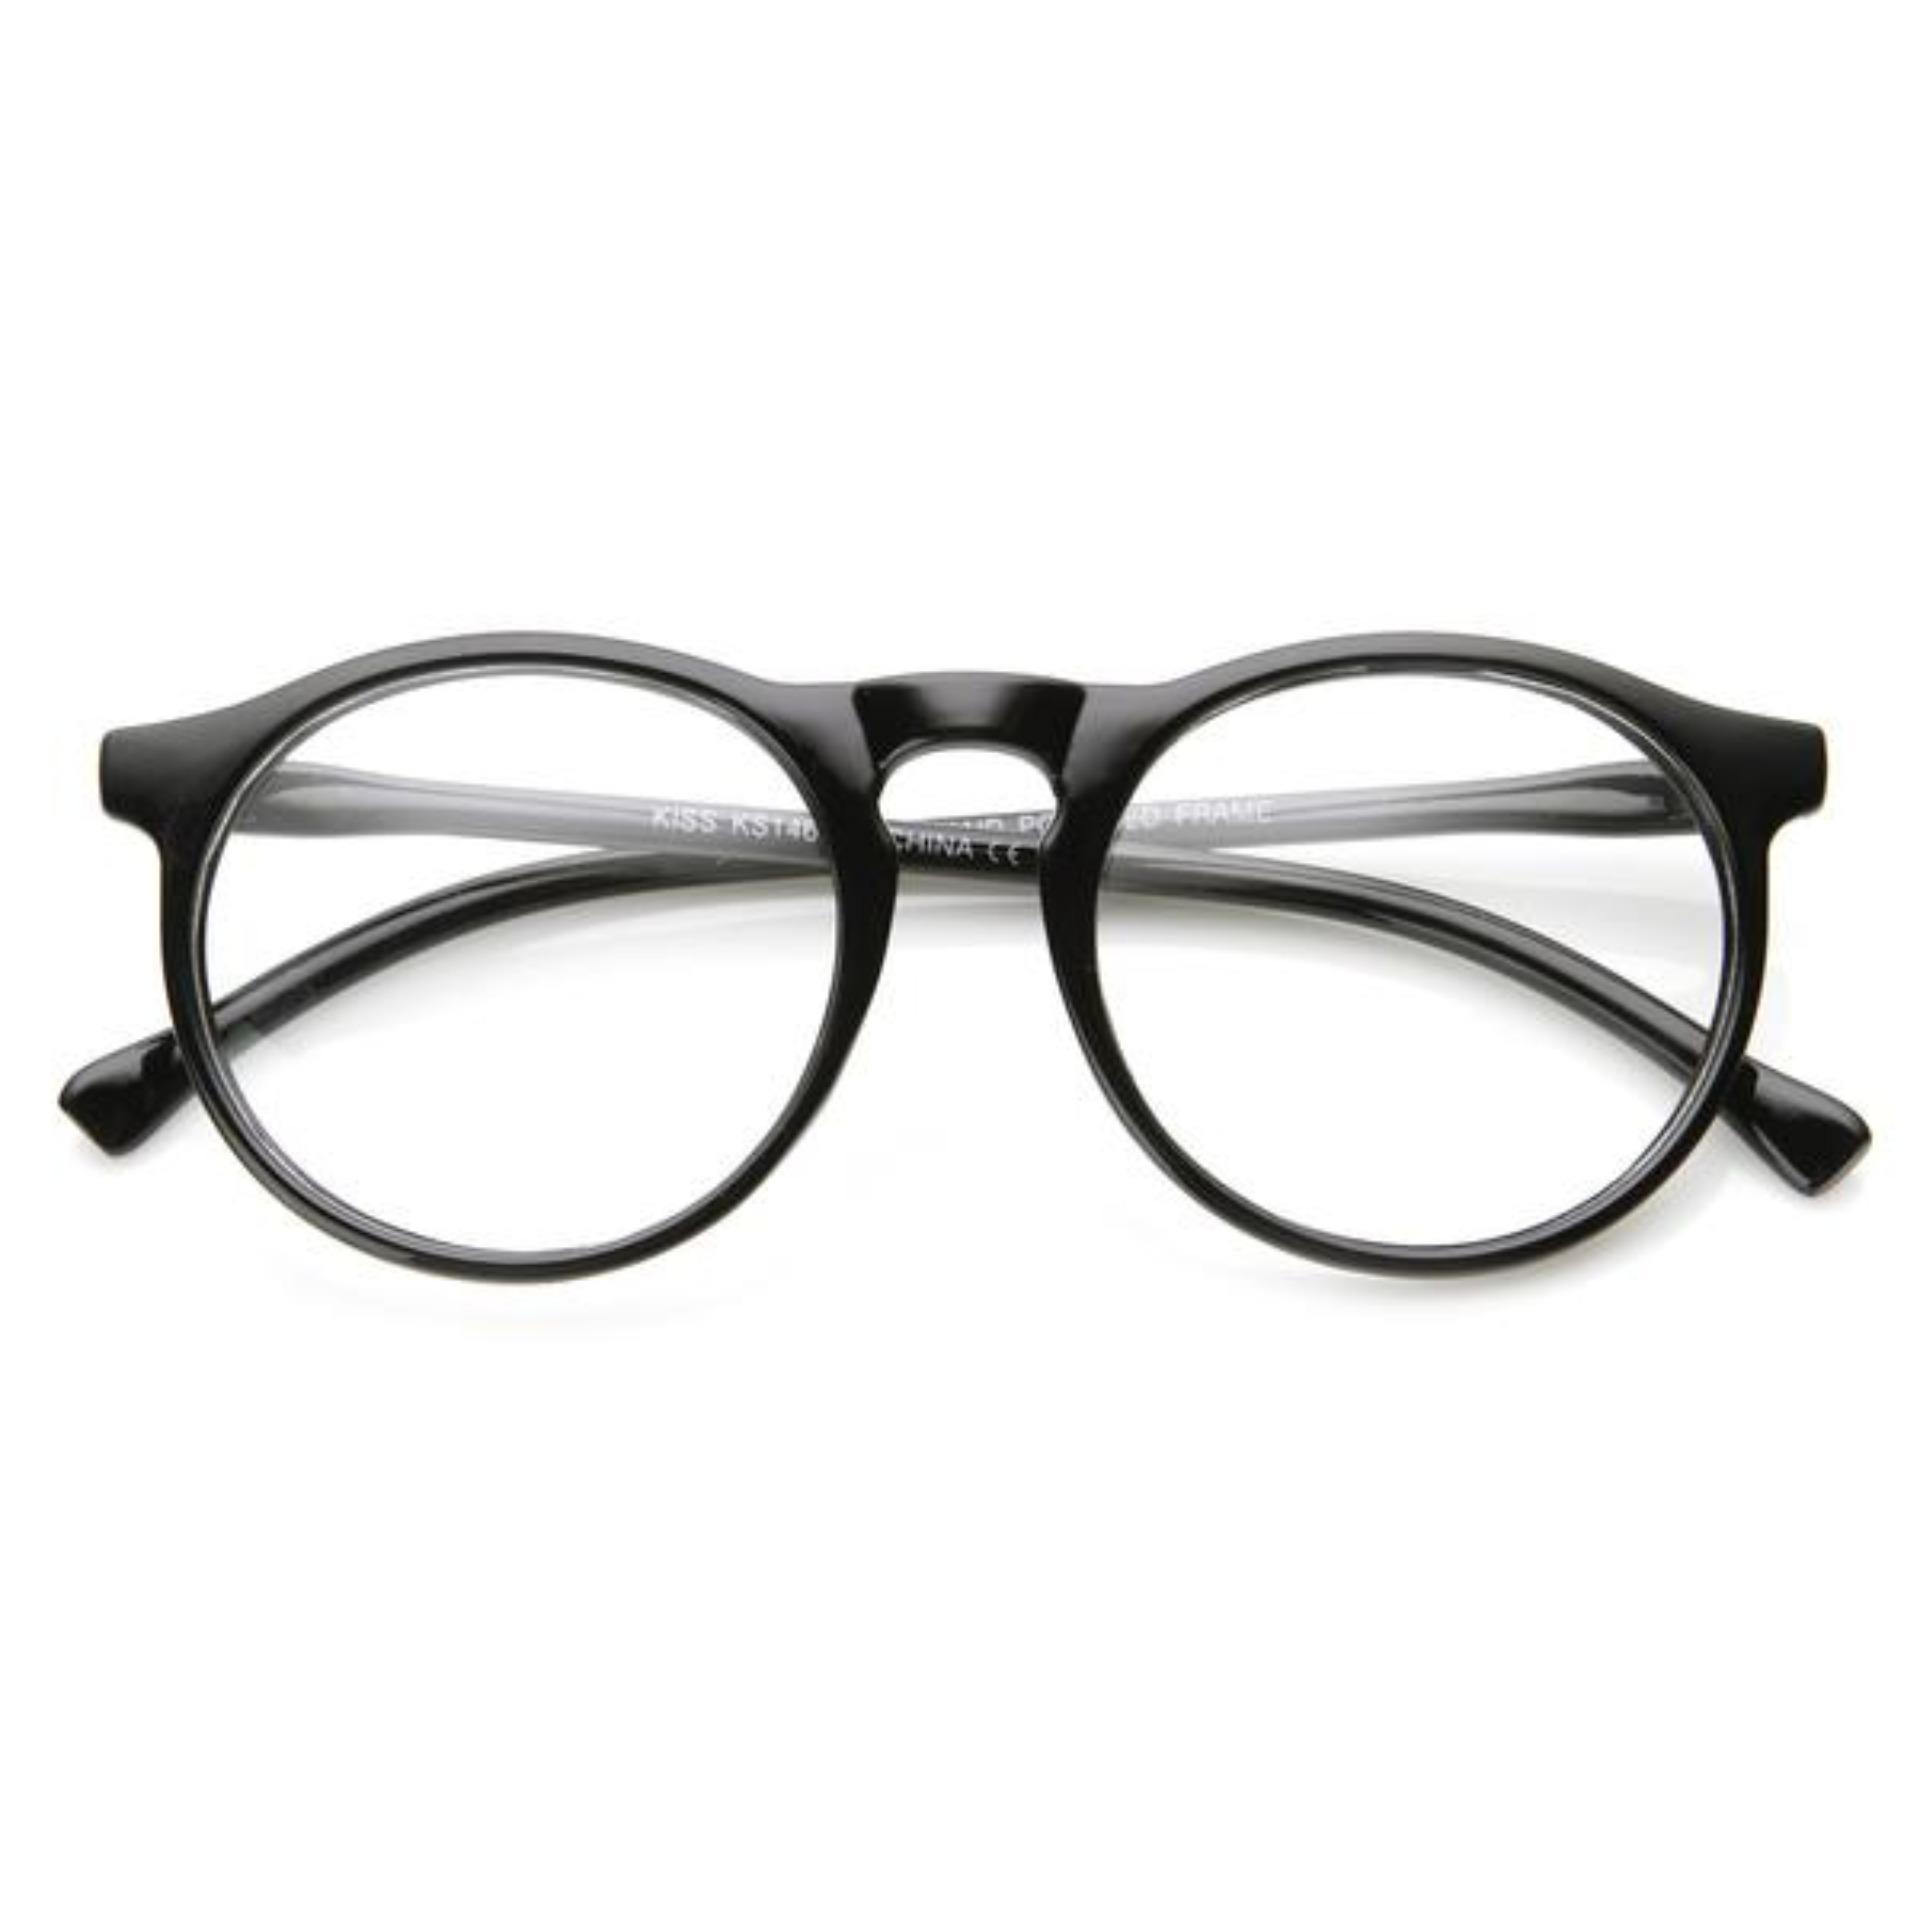 Indi Retro Round Clear Lens Fashion Glasses 14977 M - Kacamata Pria